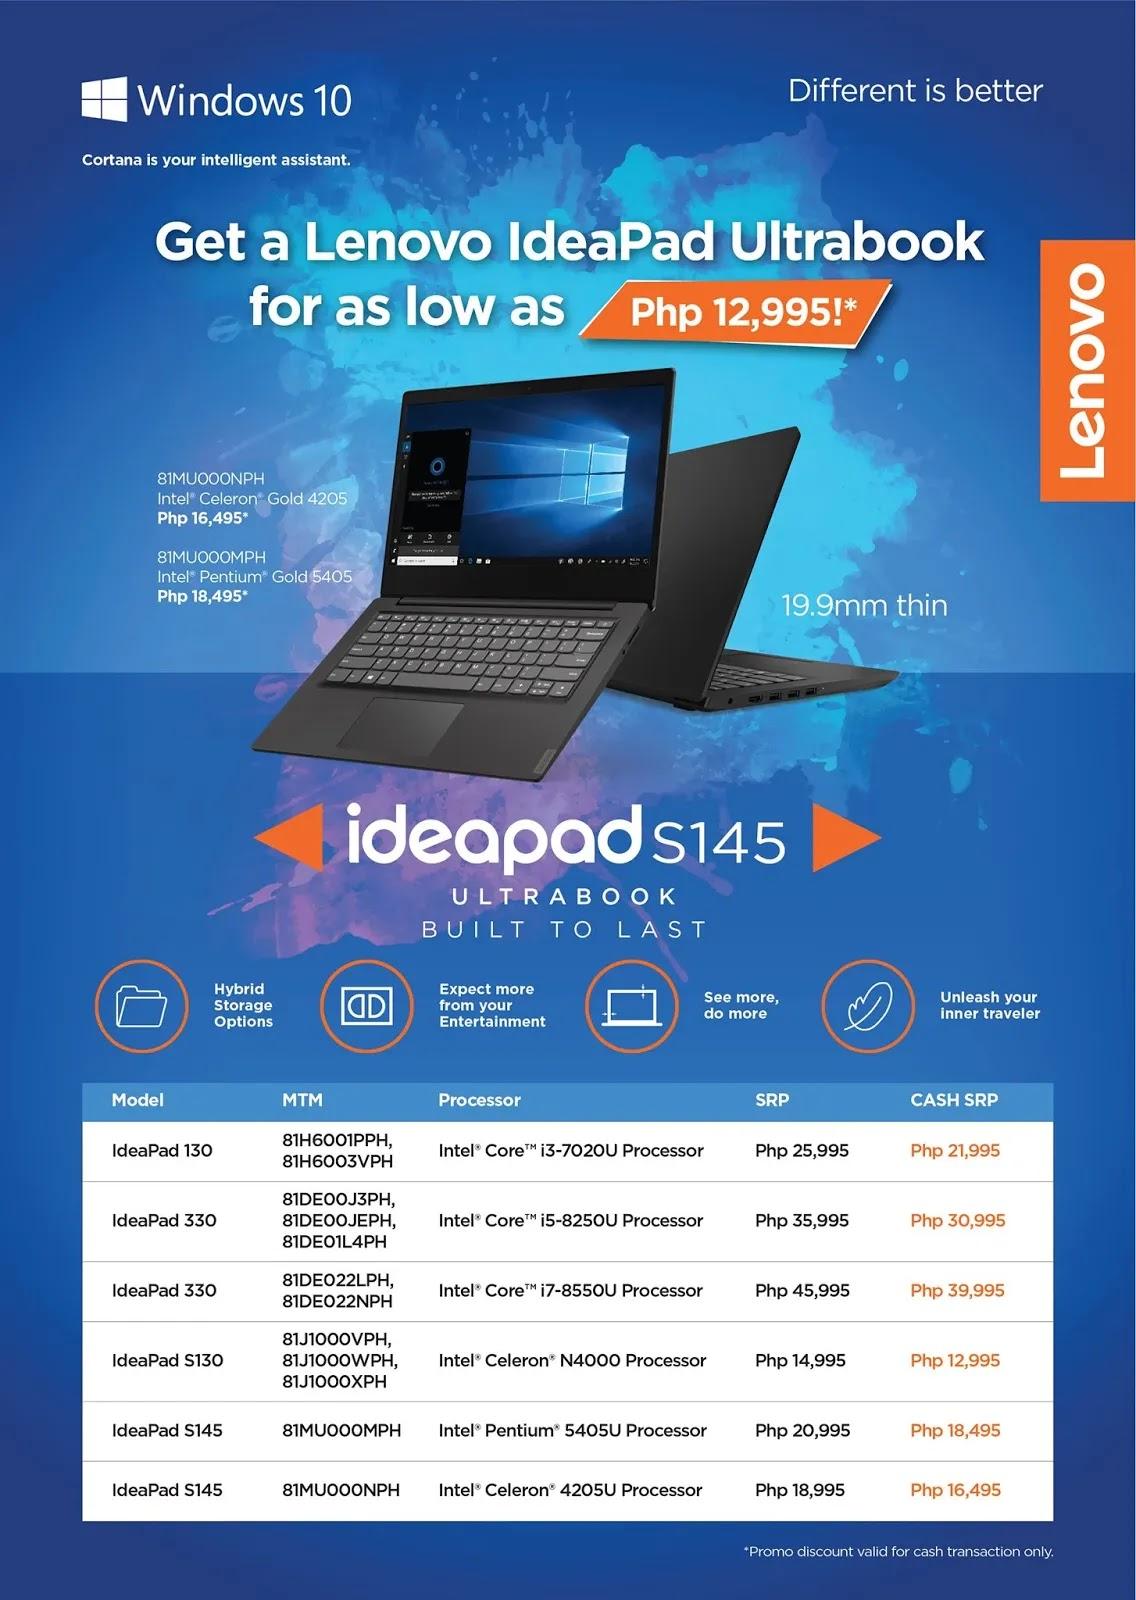 Lenovo IdeaPad Ultrabook Pre-Holiday Season Promo